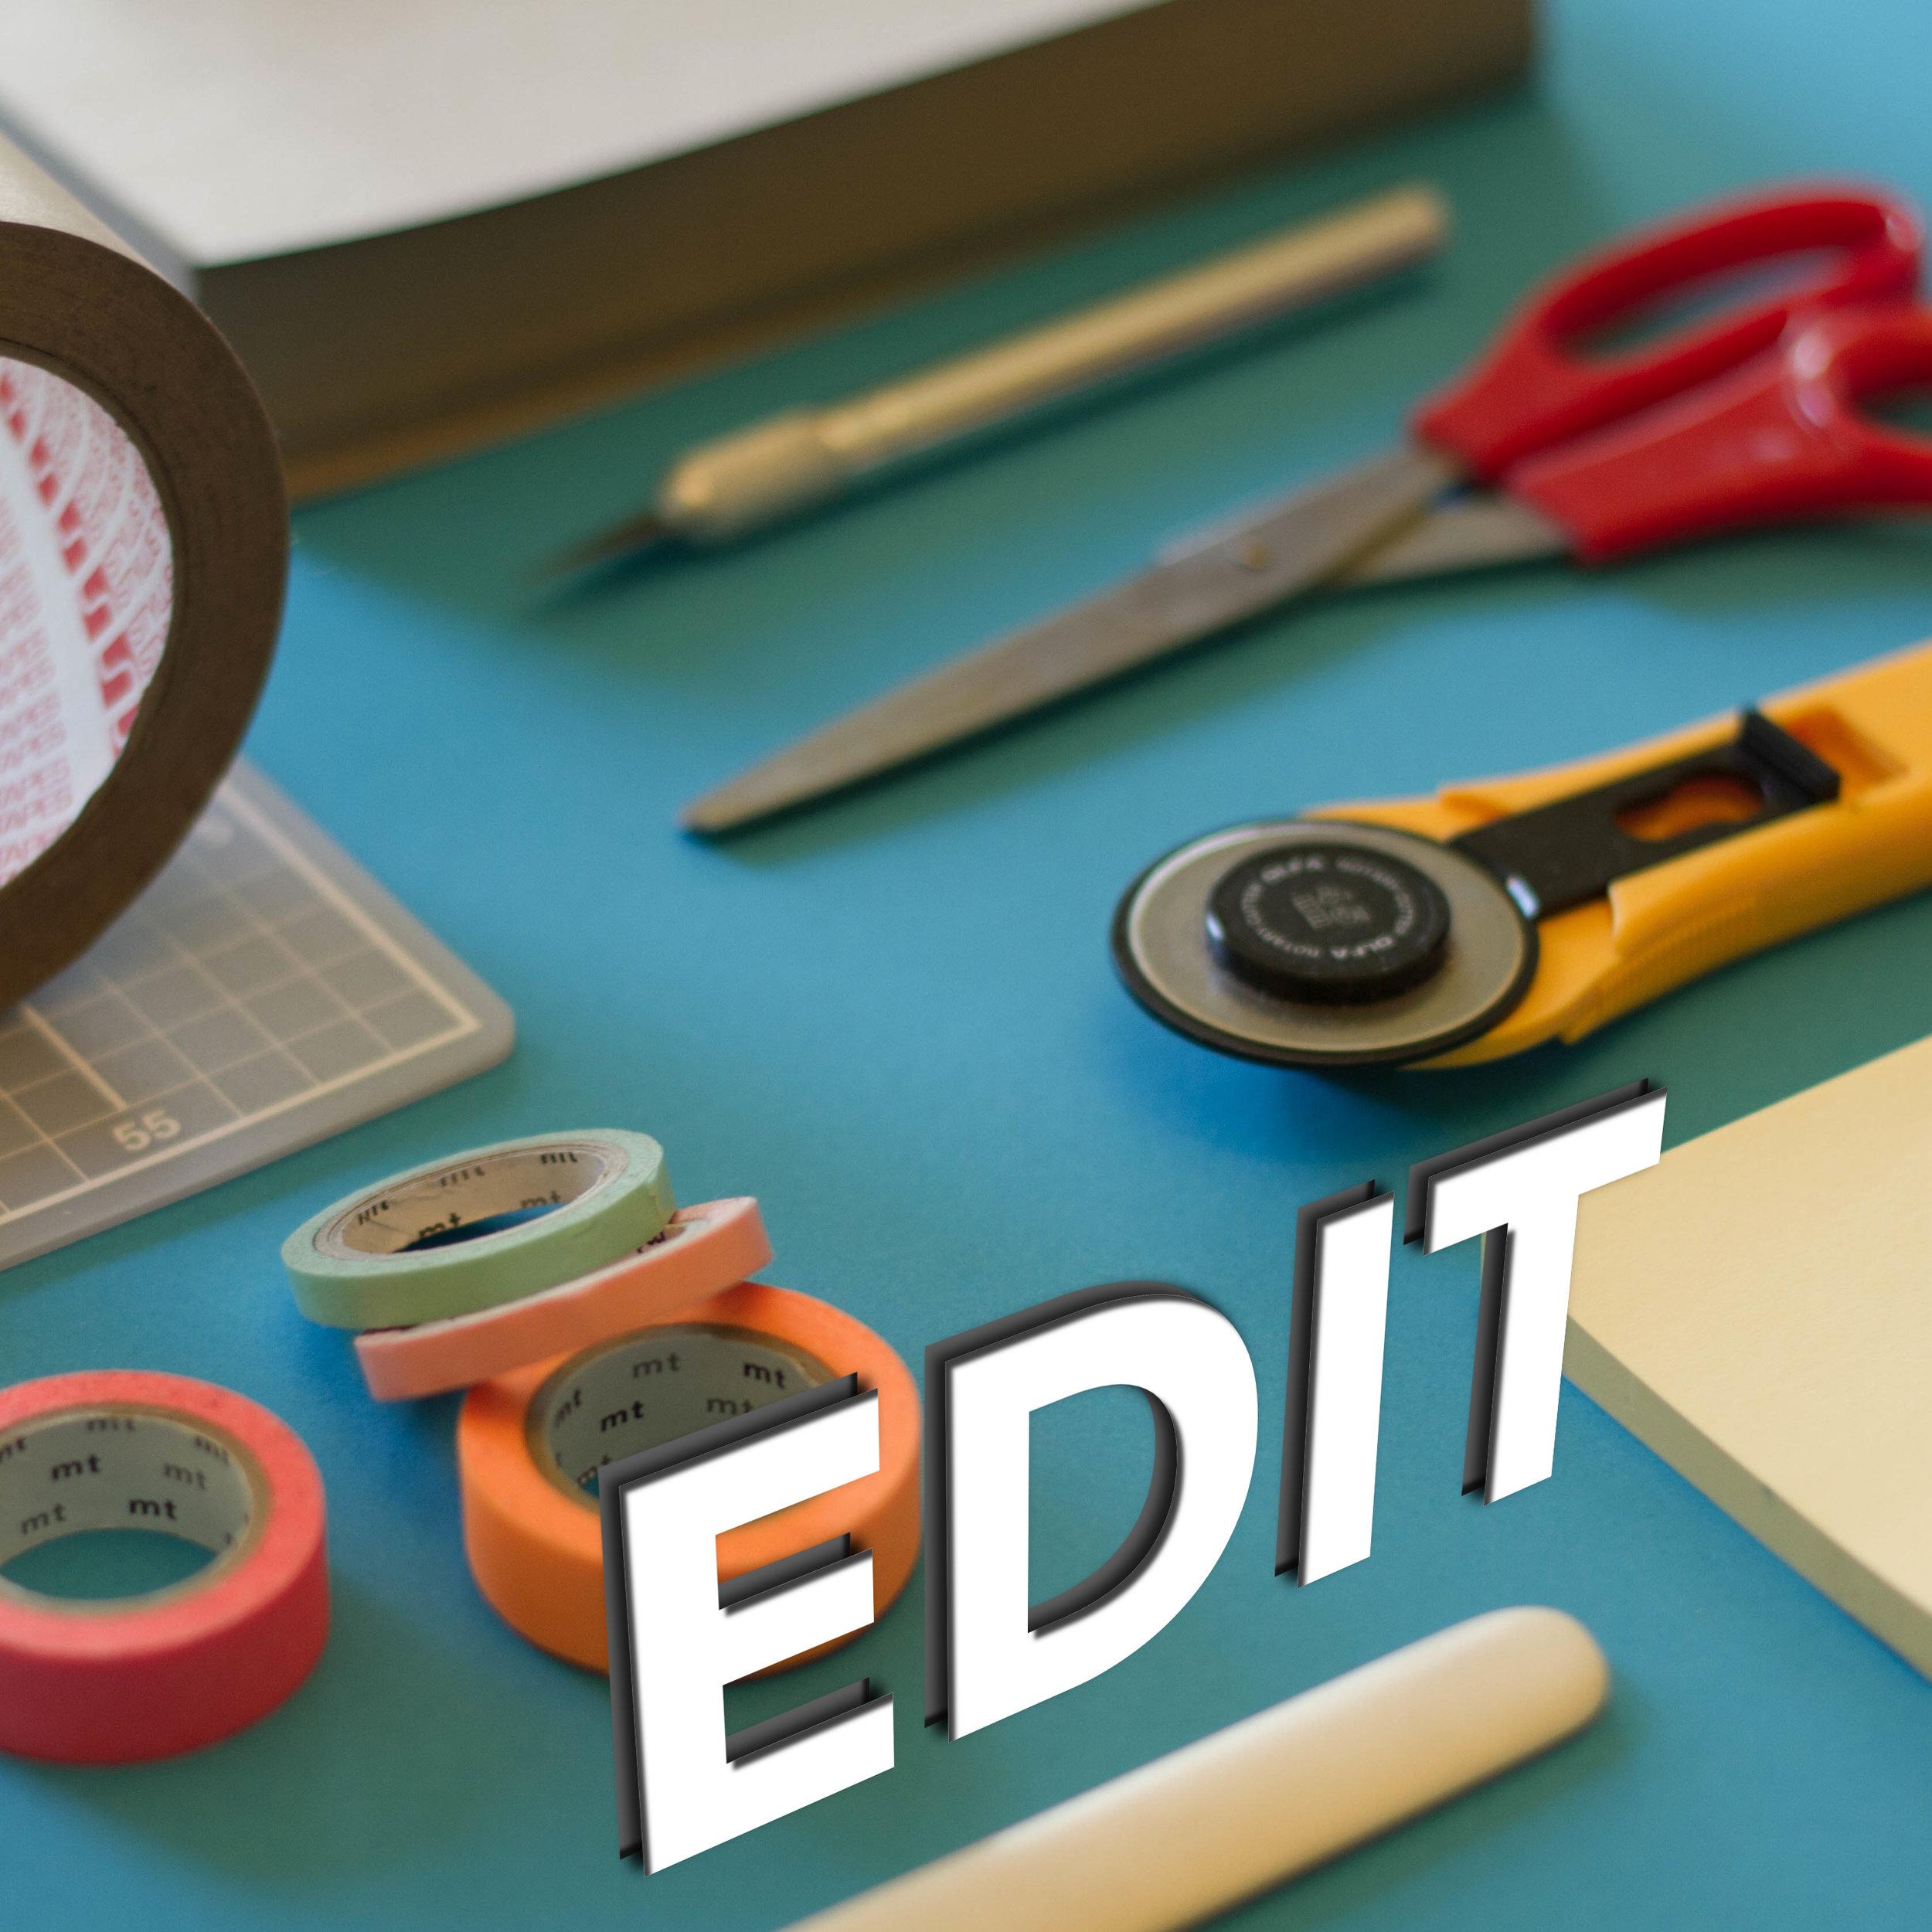 editgraphic.jpg